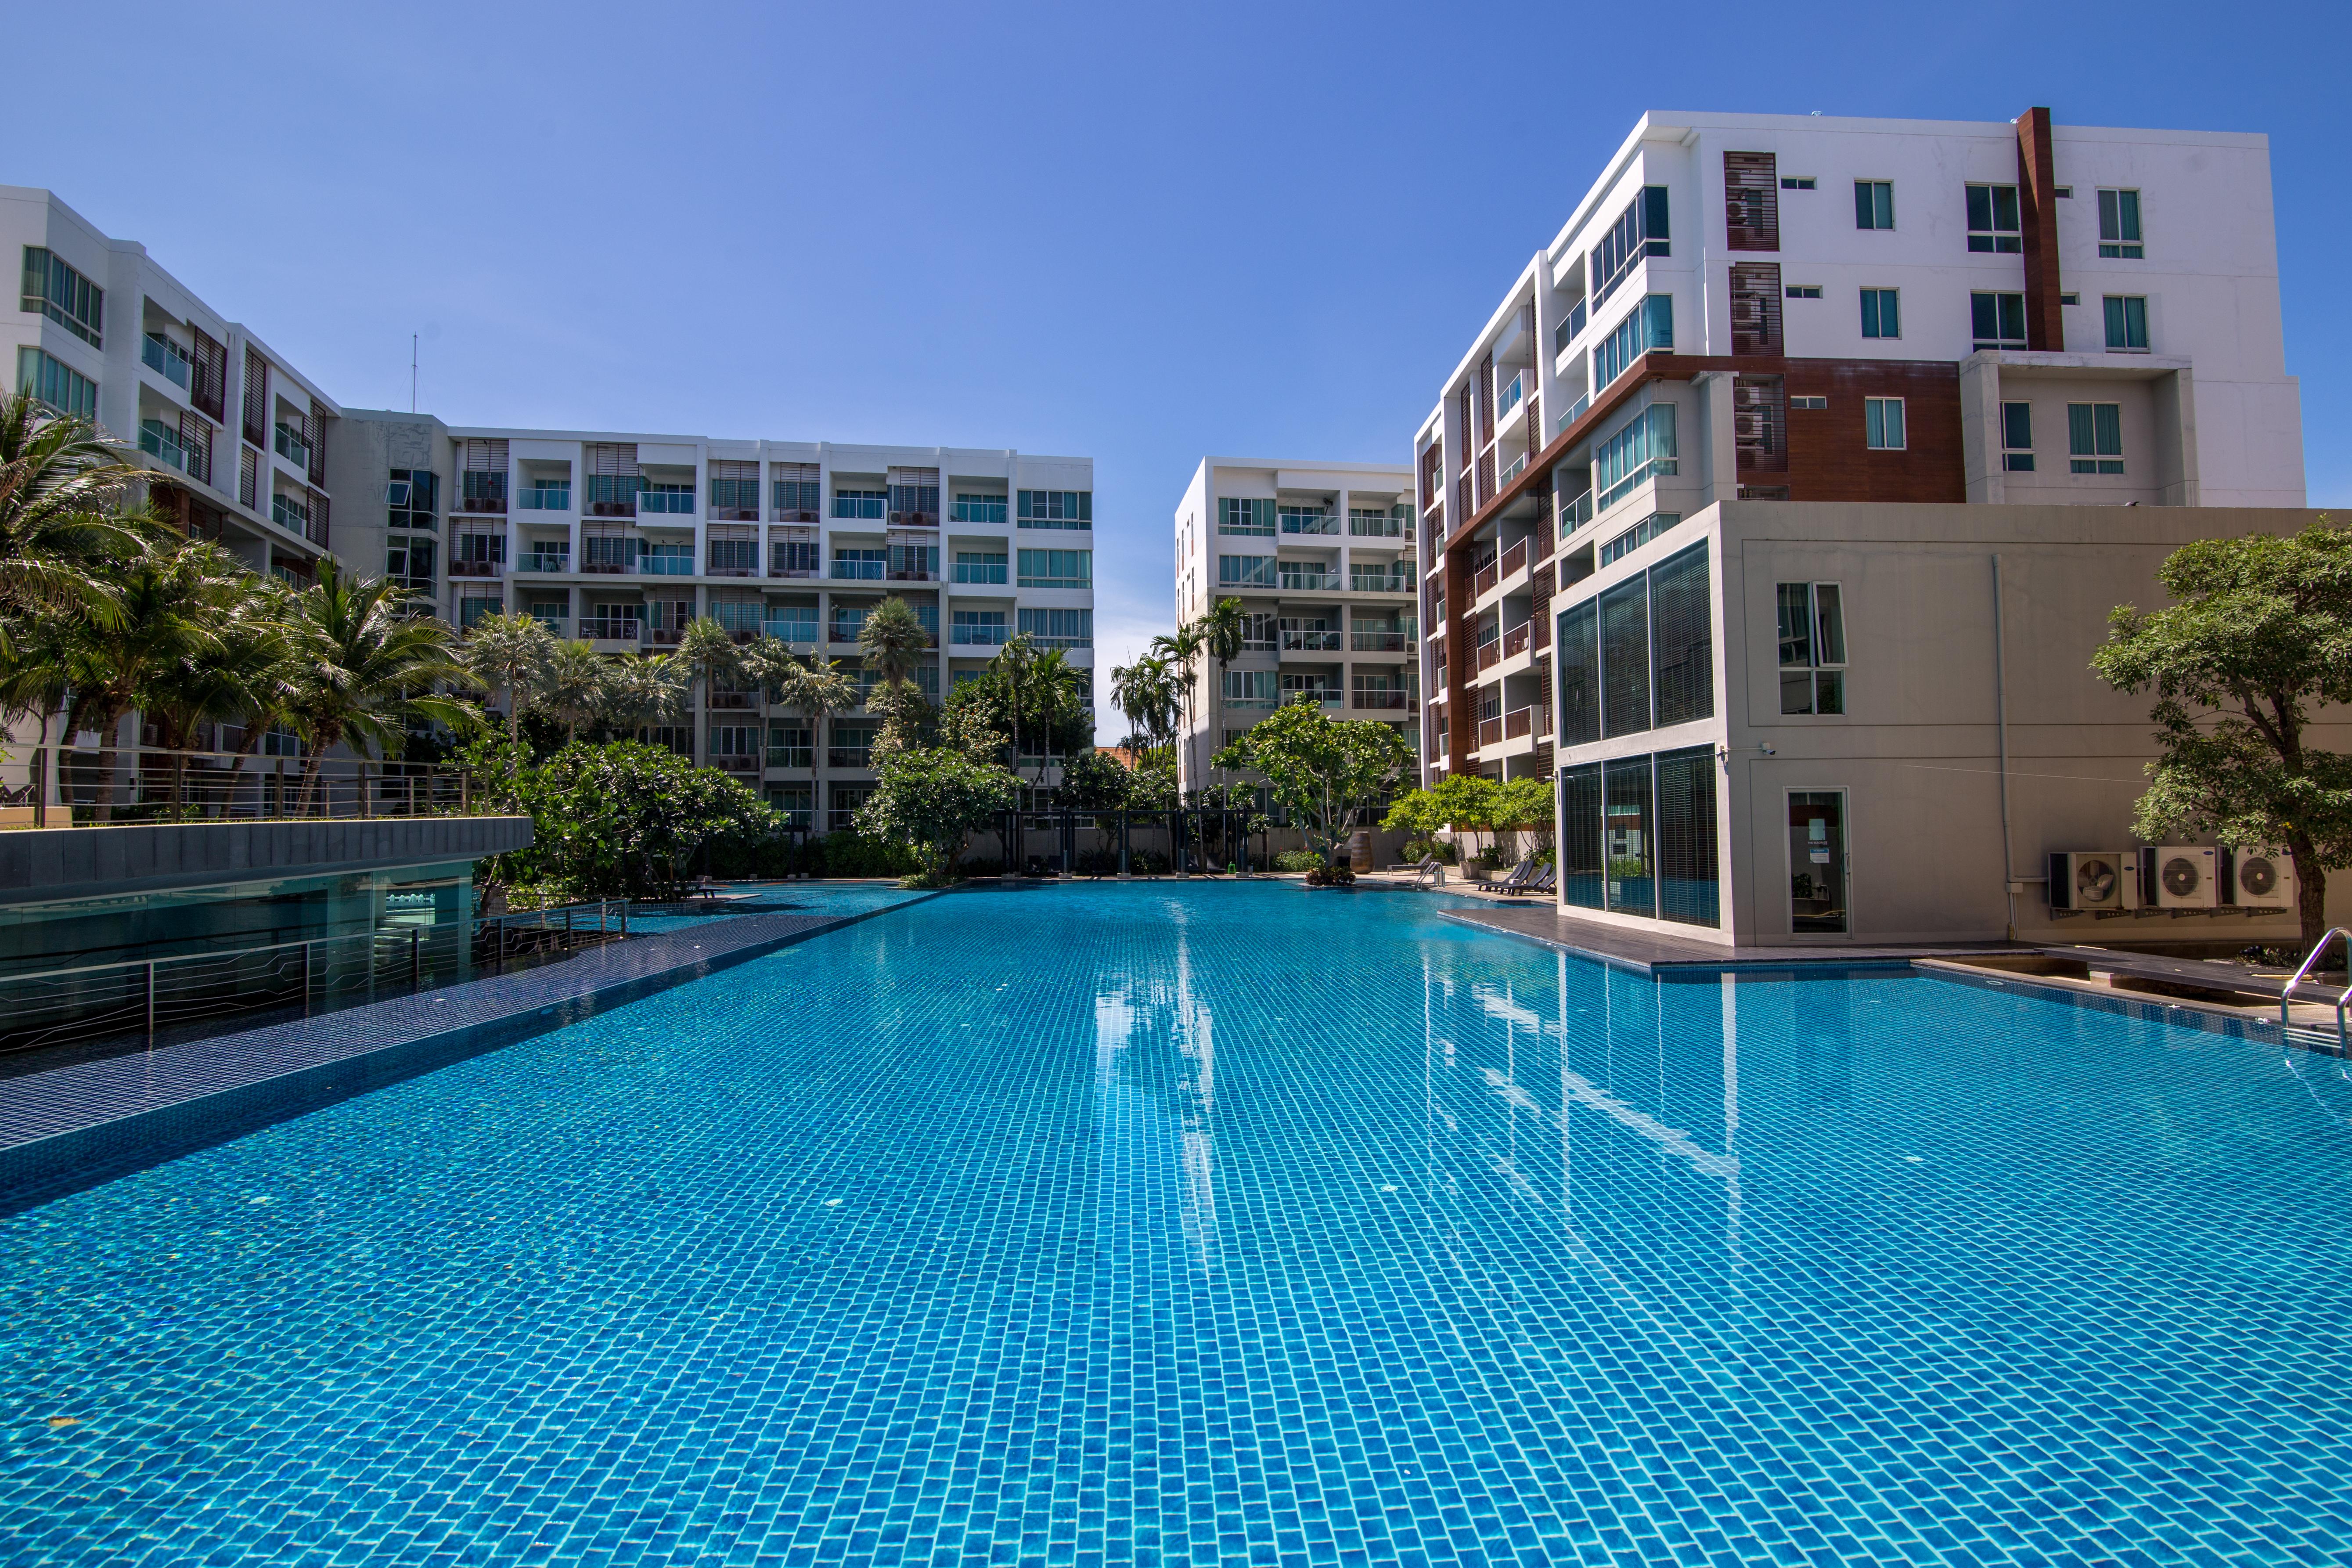 1 Bedroom for Rent at Seacraze Condominium 10,000 Baht per month